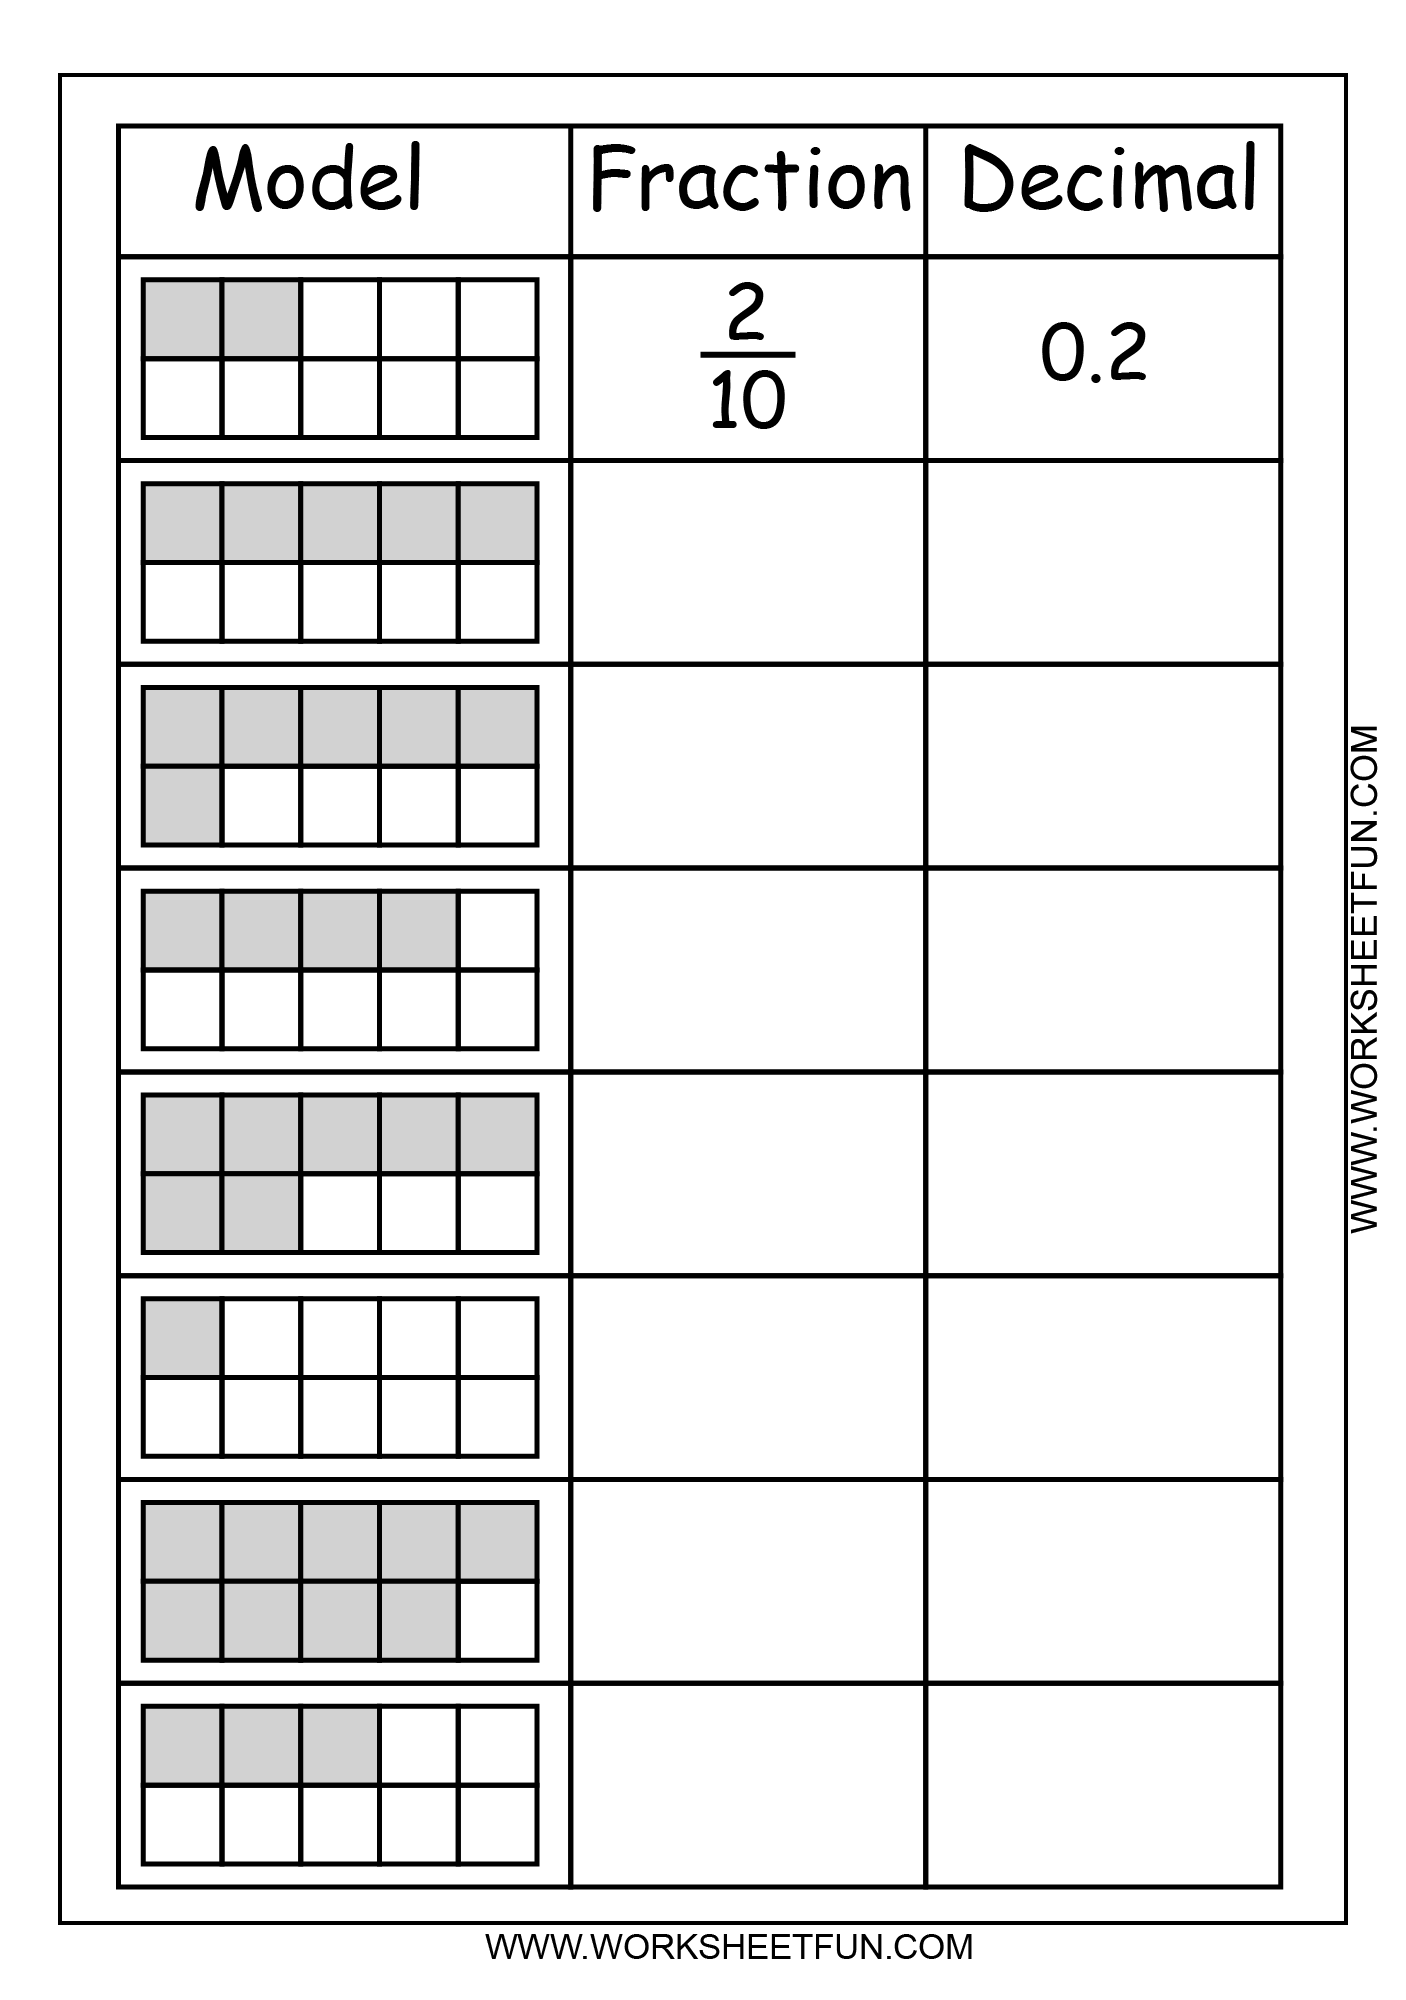 hight resolution of Multiplying Fractions Using Models Worksheet - Nidecmege